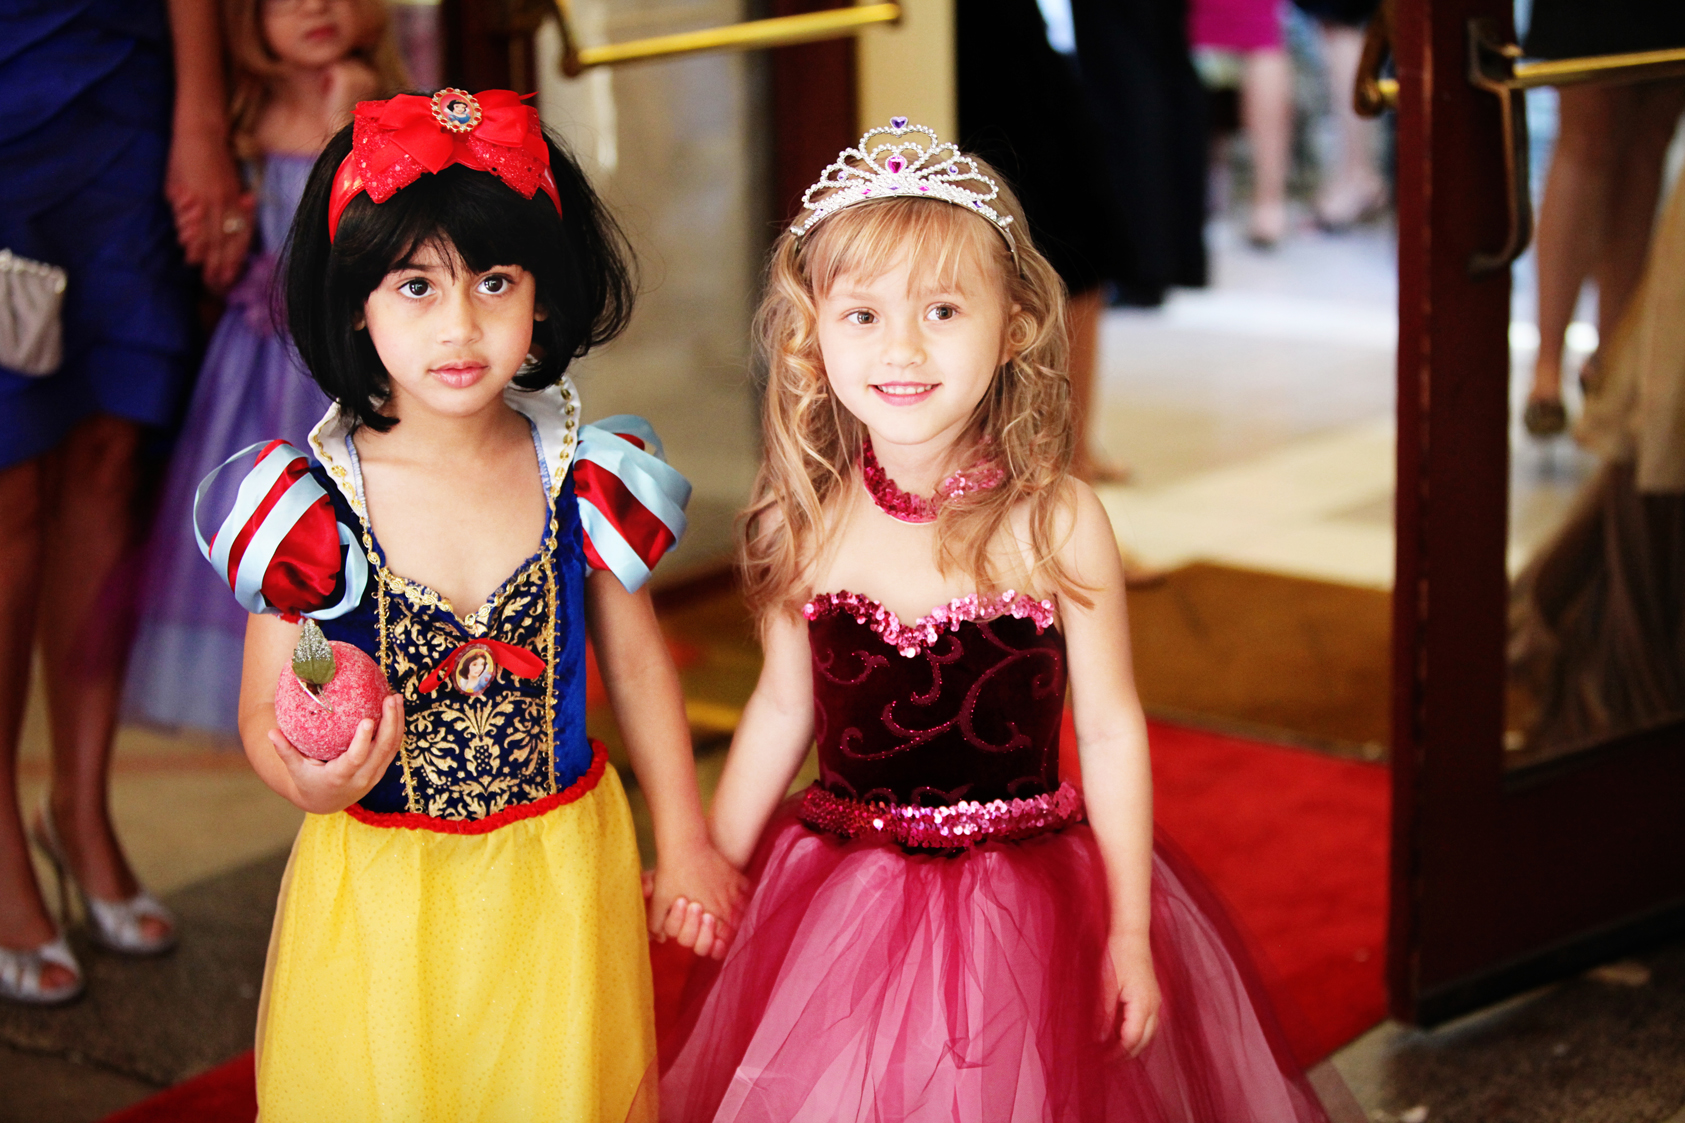 Theatre IV Fairy Tale Ball 2009 Red Carpet.jpg